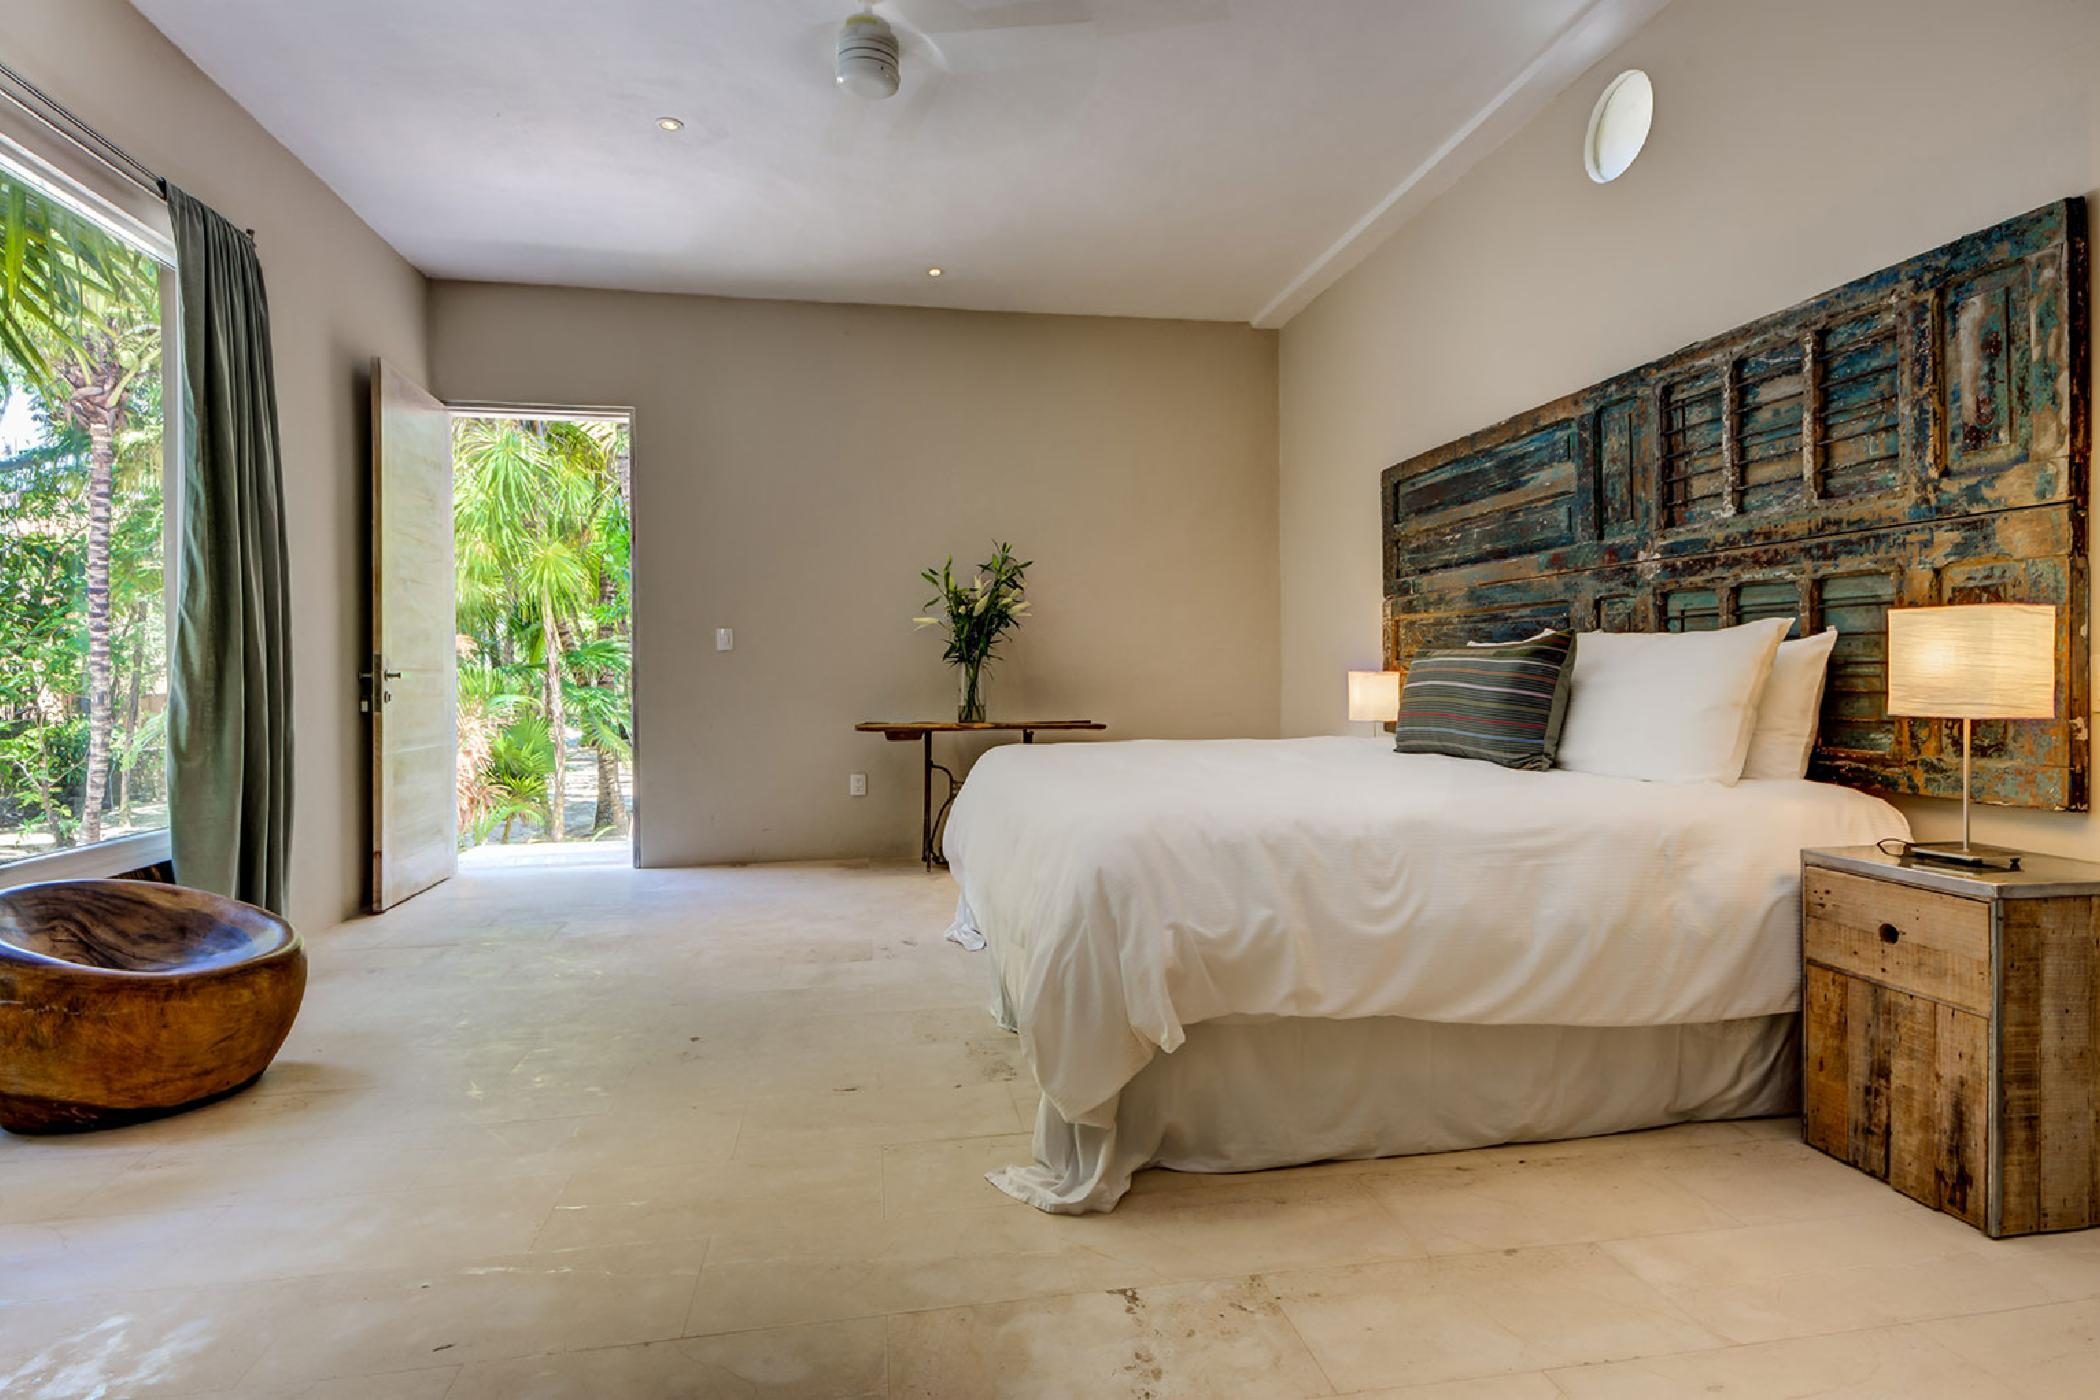 Maya_Luxe_Riviera_Maya_Luxury_Villas_Experiences_Puerto_Aventuras_5_Bedrooms_Zacil_Na_23.jpg